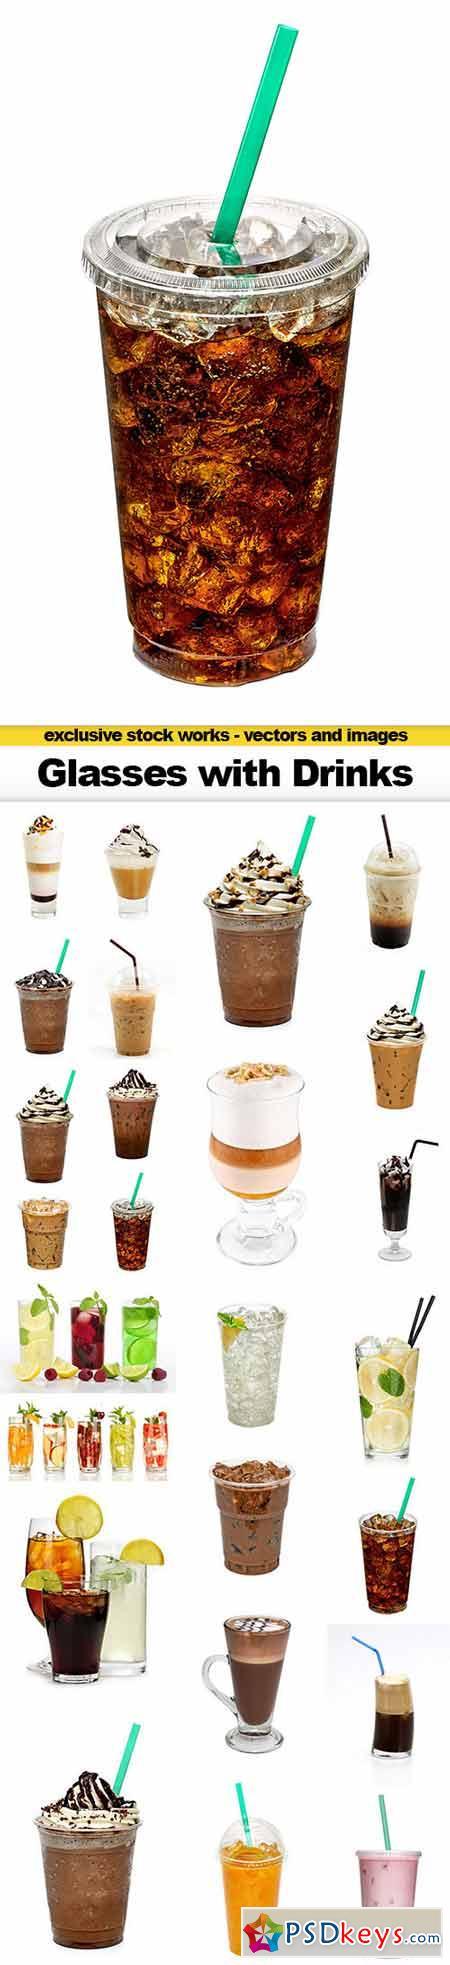 Glasses with Drinks, 25x UHQ JPEG